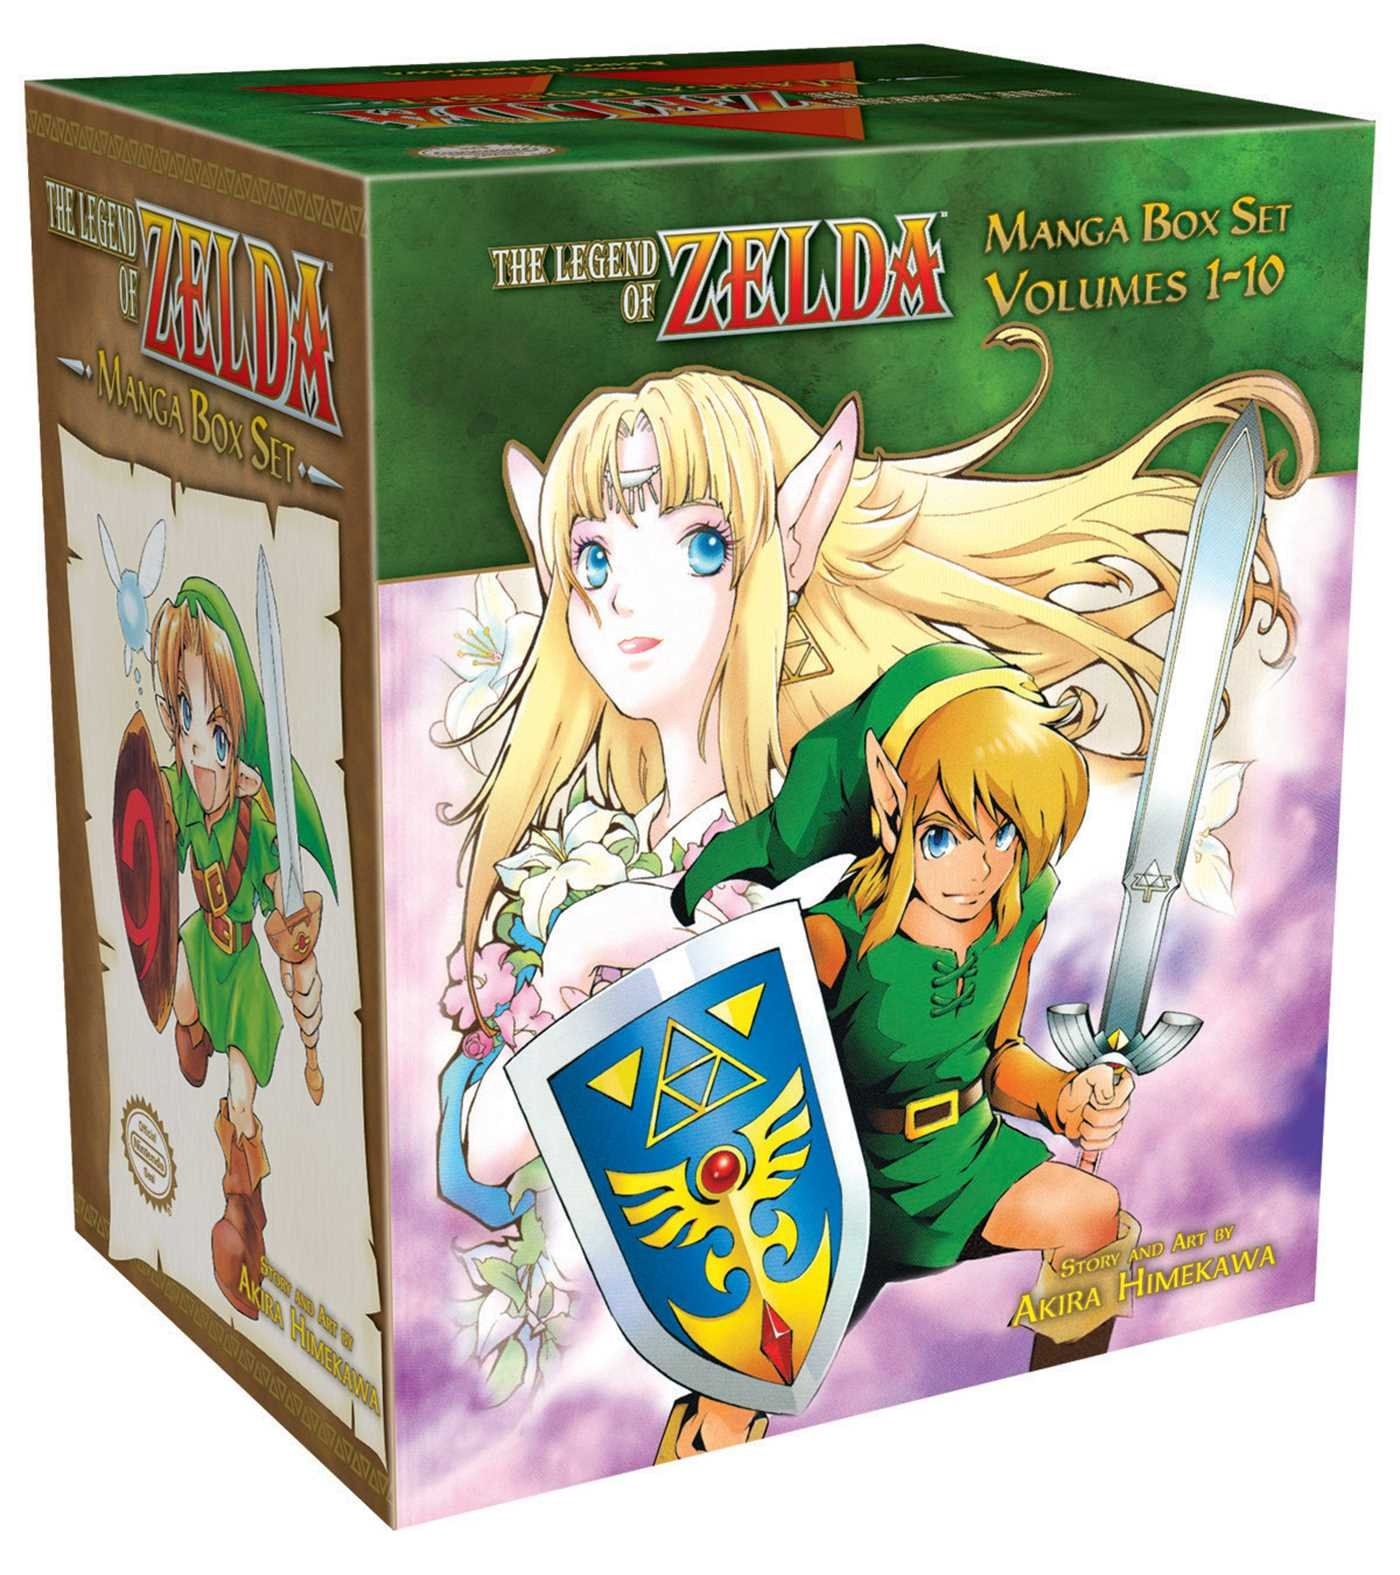 The Legend of Zelda Box Set by VIZ Media - Children's